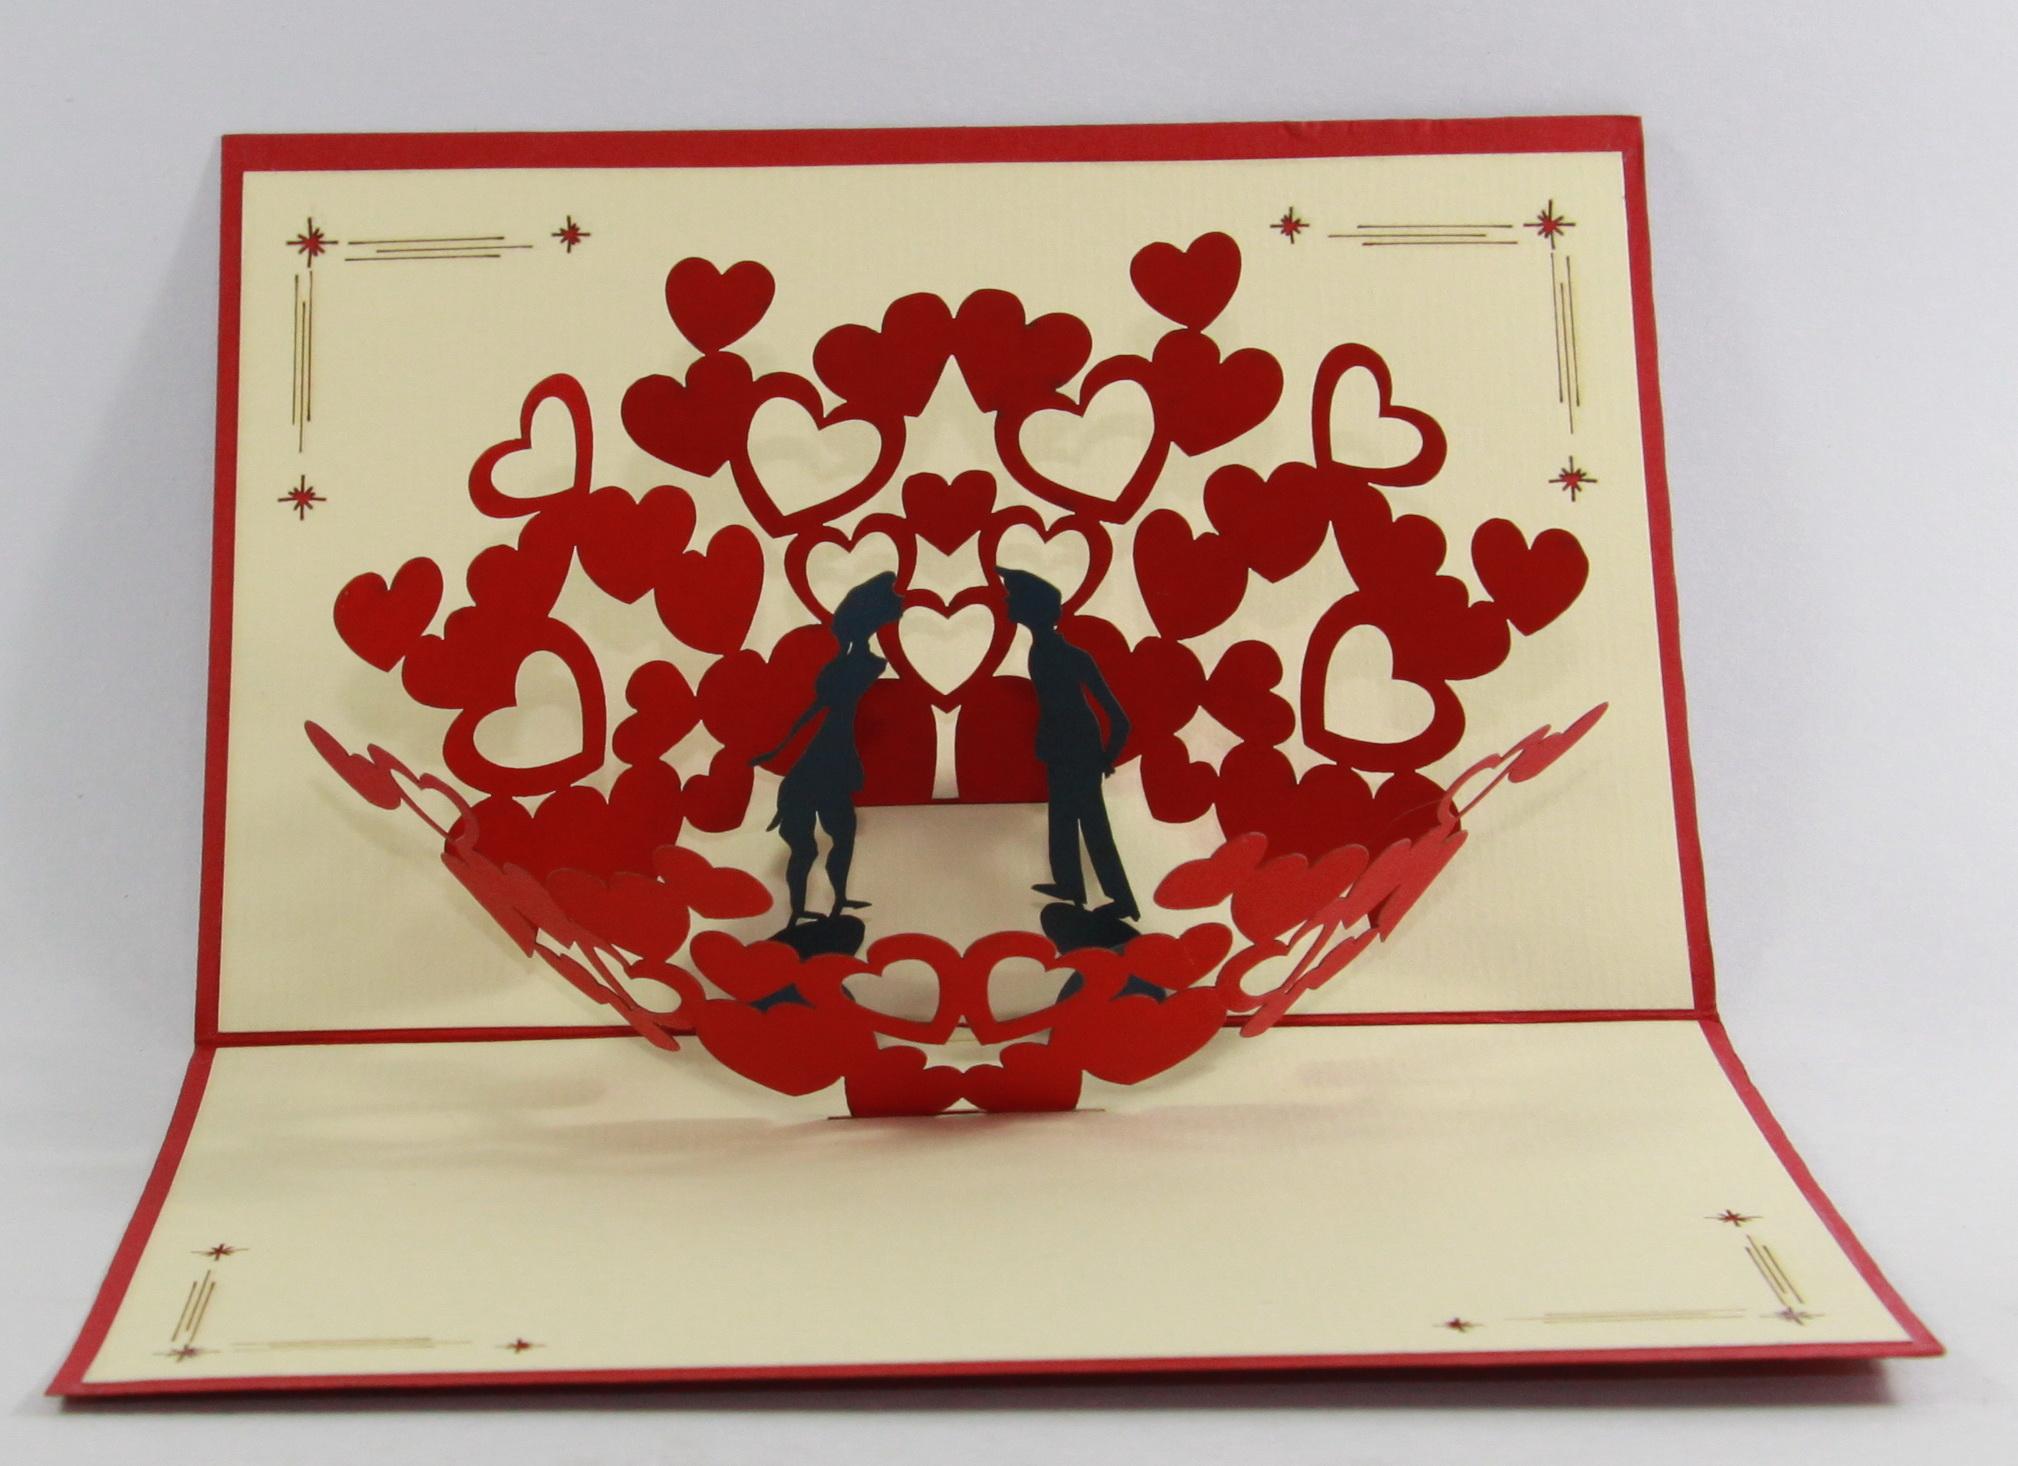 D pop up cards birthday anniversary valentine special